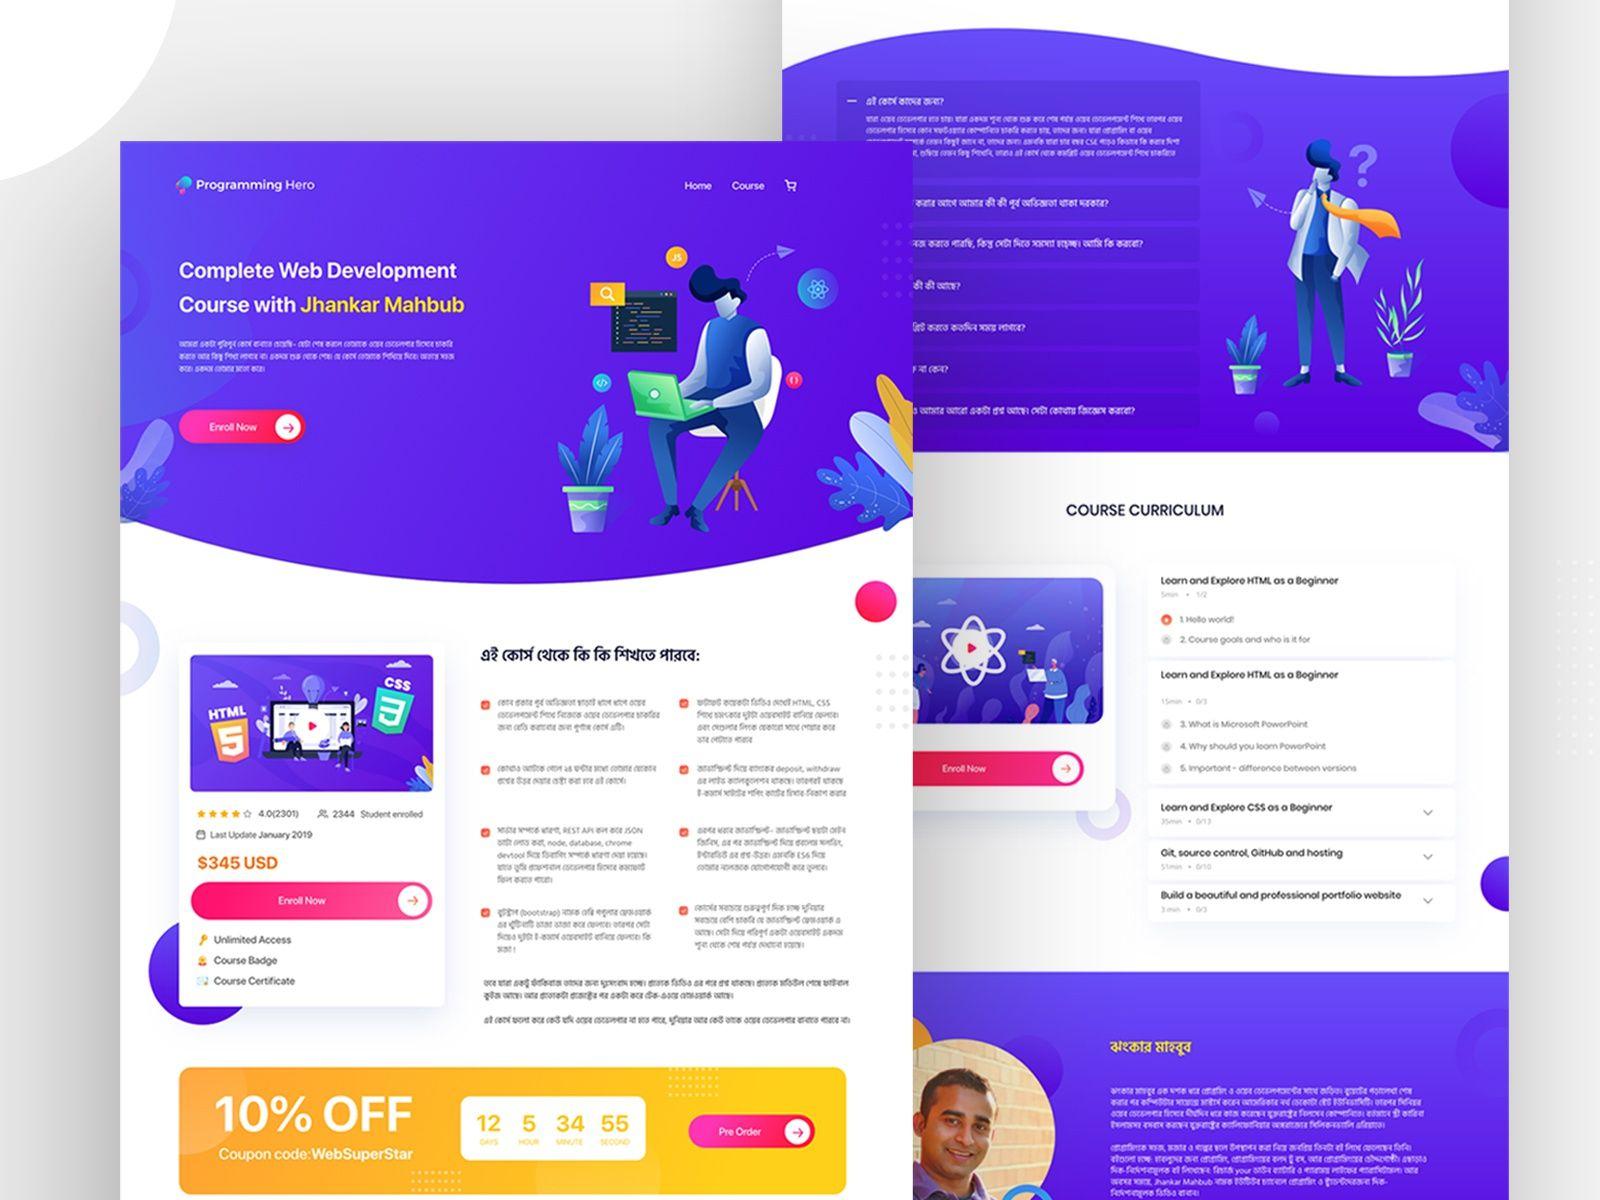 Complete Web Development Course Programming Hero In 2020 Web Development Course Web Development Development